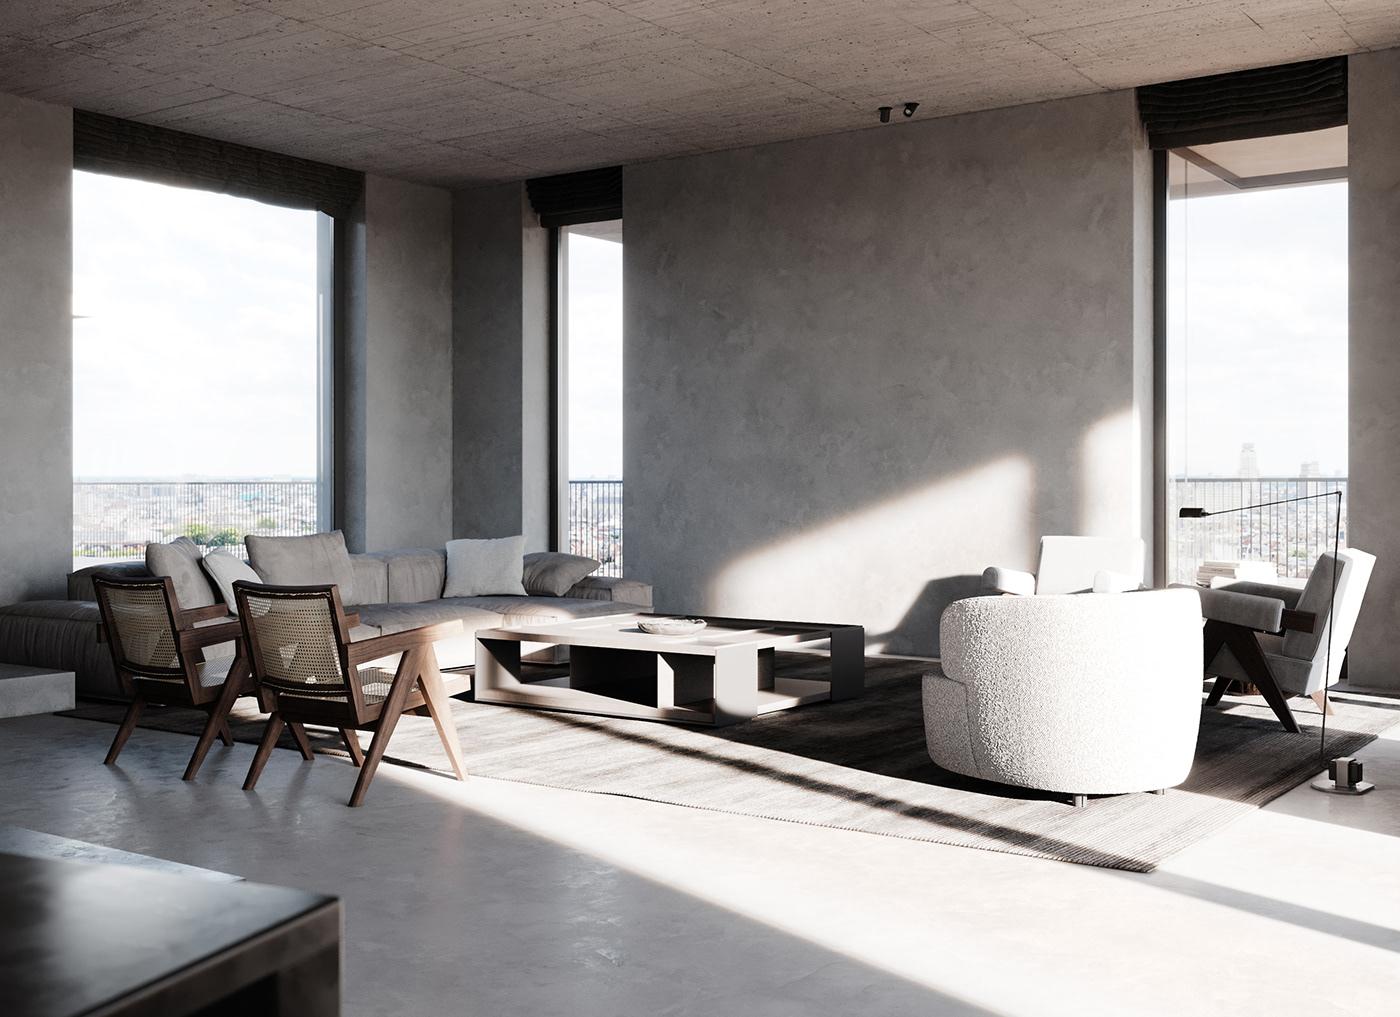 architecture archviz Brutalism CGI cinematic interior design  Minimalism minimalist rendering visualization